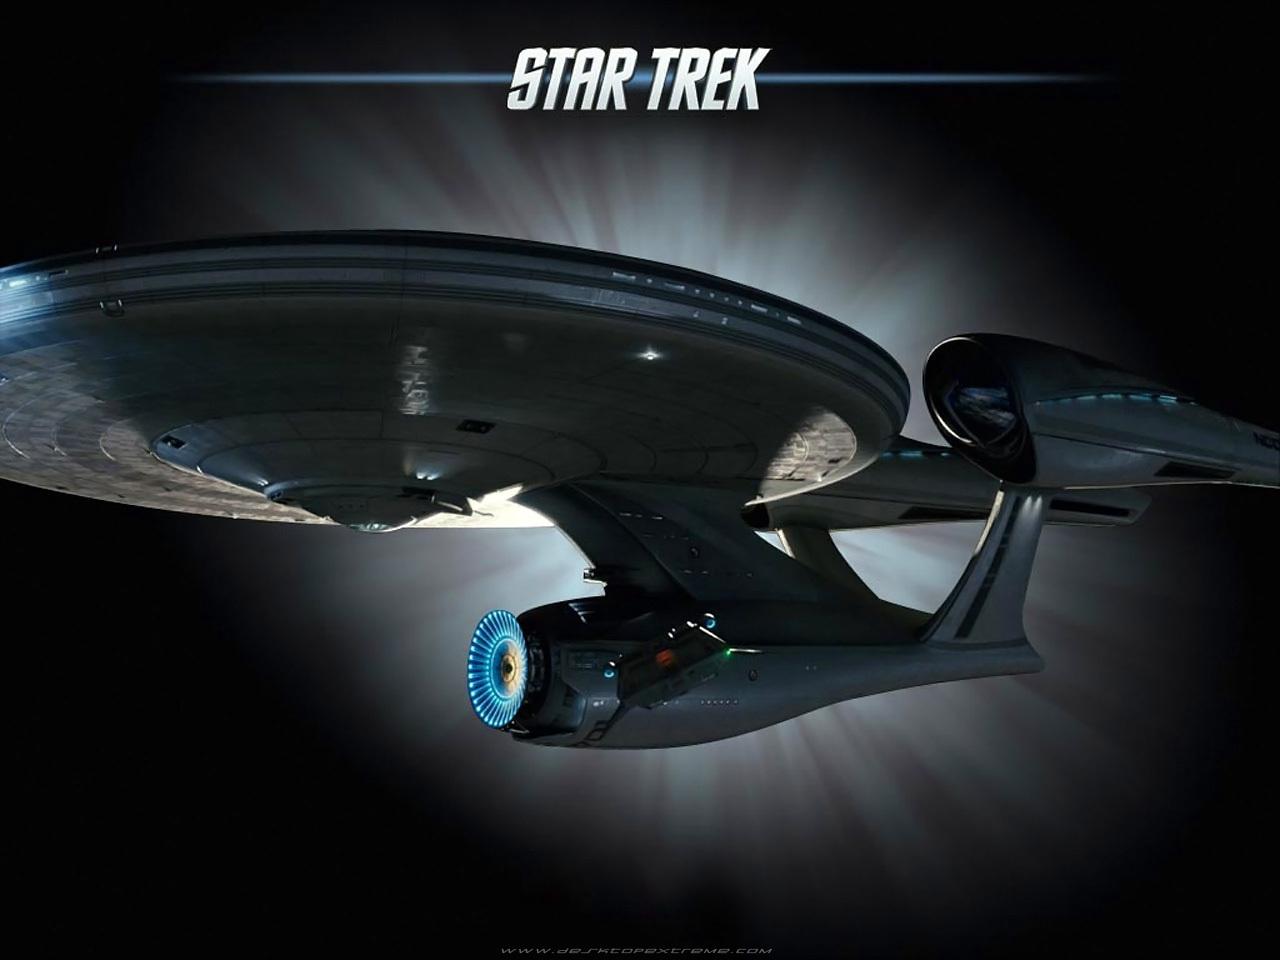 Star Trek   Star Trek Wallpaper 5346193 1280x960